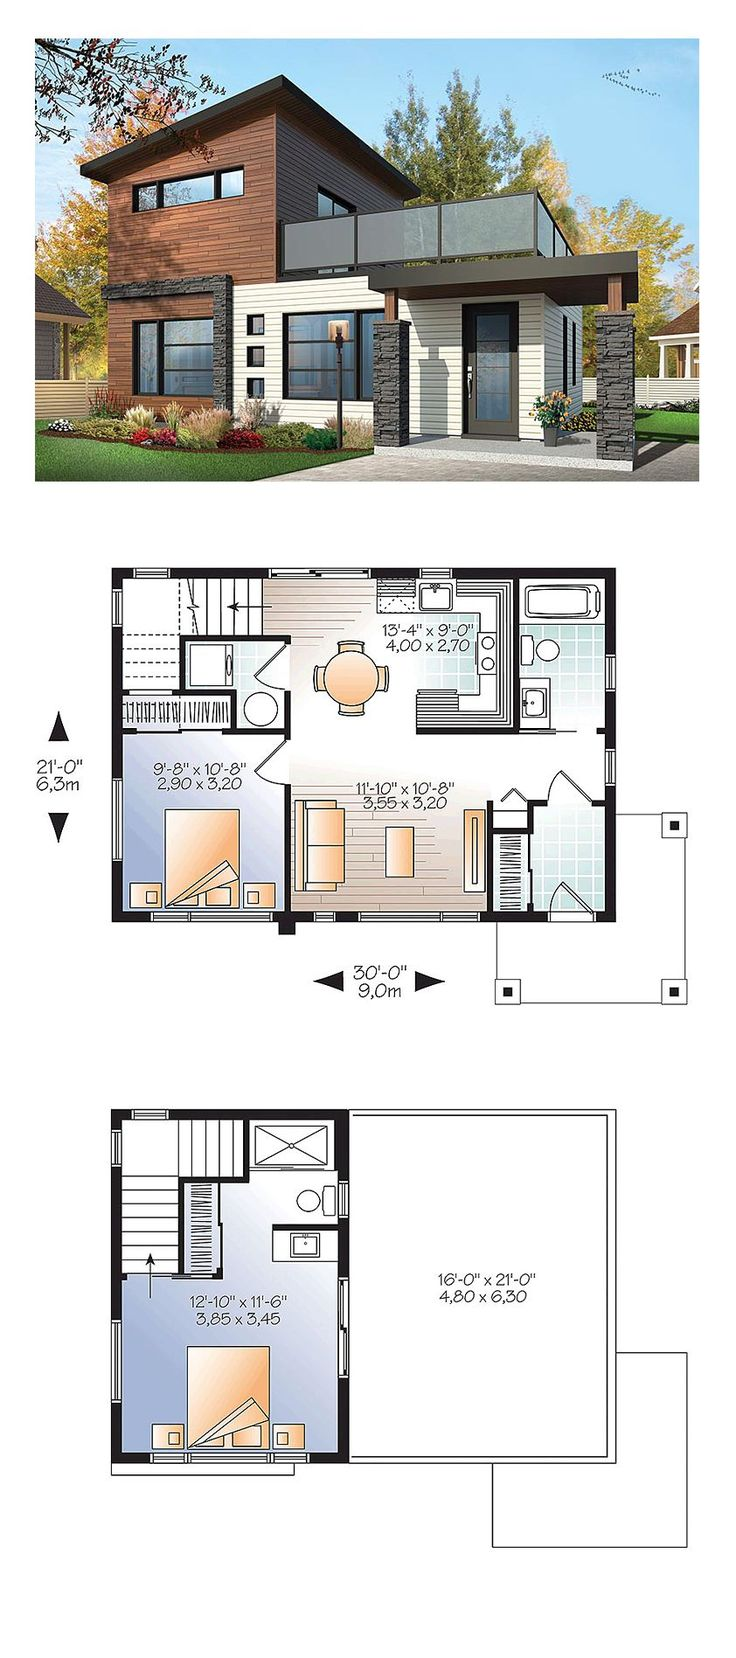 Kleines badezimmer design 5 'x 6'  best 건축물 images on pinterest  modern homes contemporary